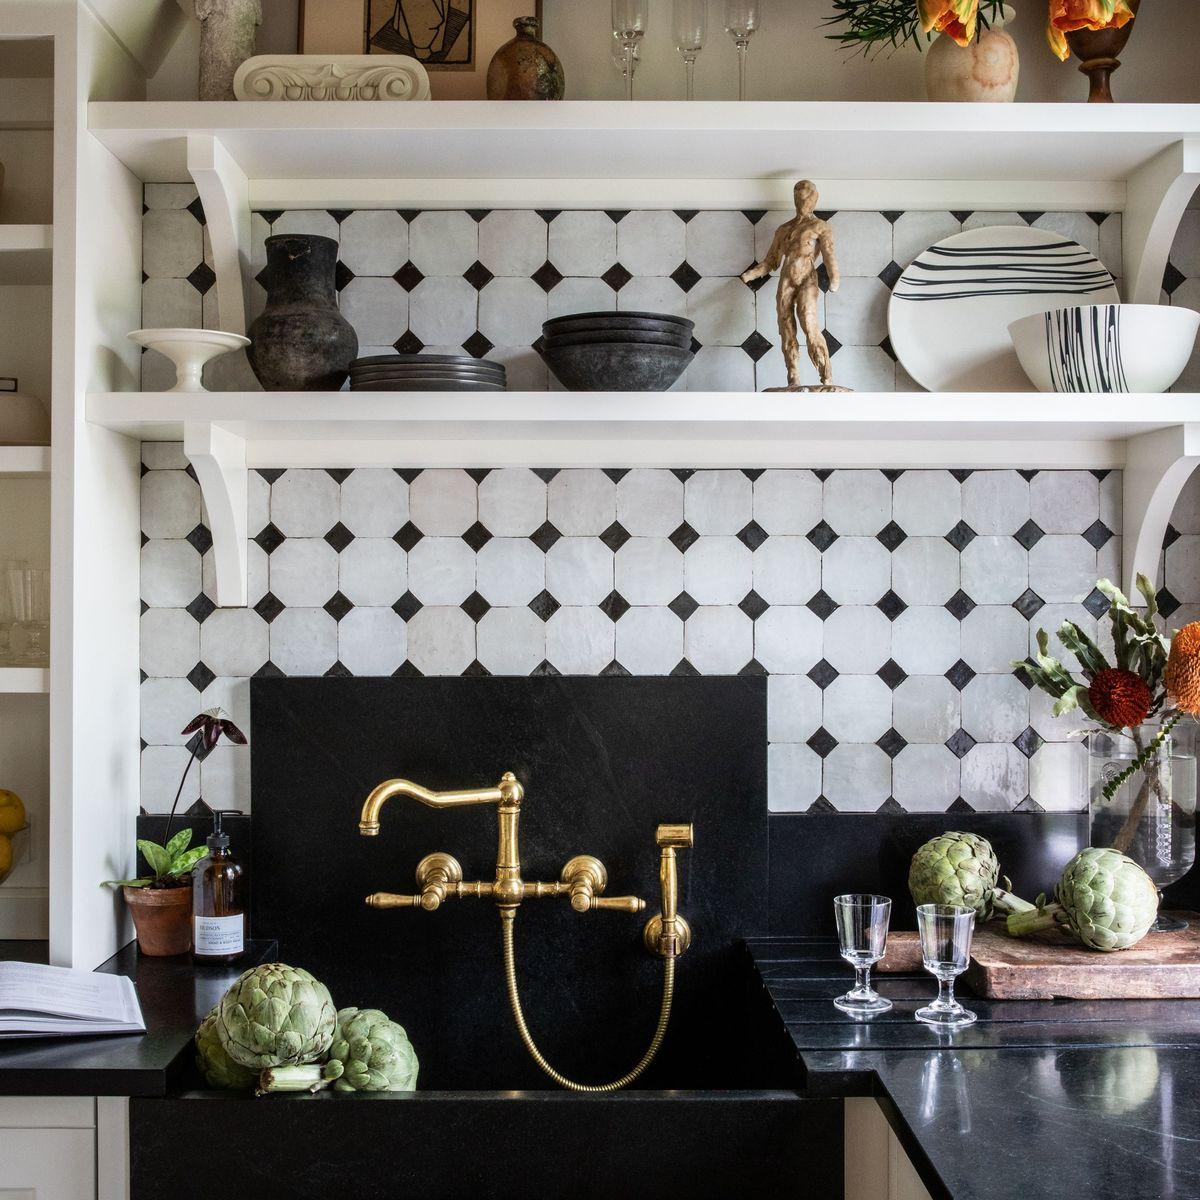 - Kitchen Backsplash Ideas - Wall Tiles For All Kitchen Styles